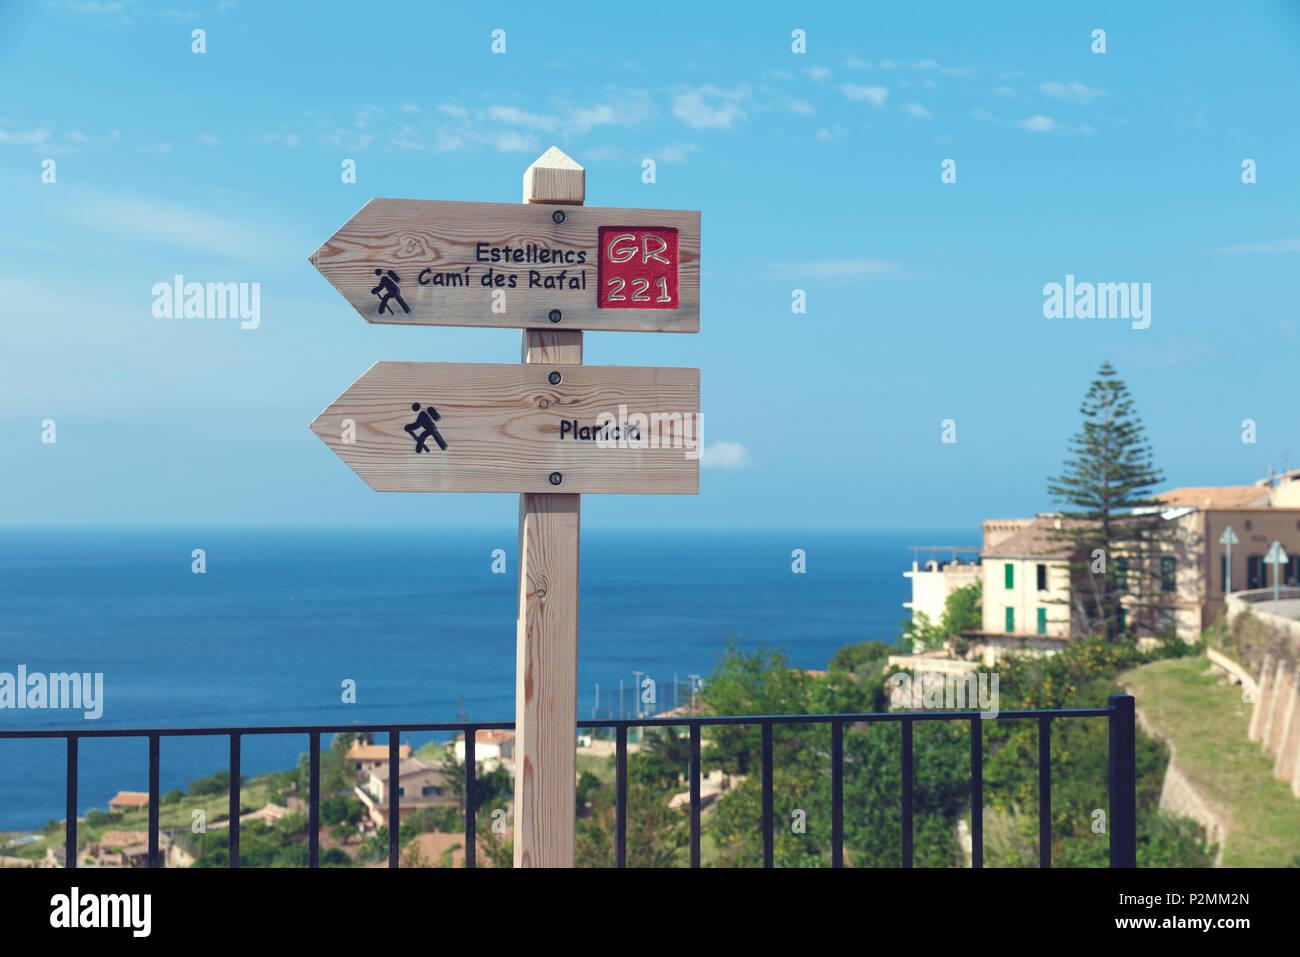 2018, 12 May, Banyalbufar, Majorca, Spain. Wooden signs for touristic routes. Banyalbufar is a small coastal village in Serra de Tramuntana Mountains  - Stock Image